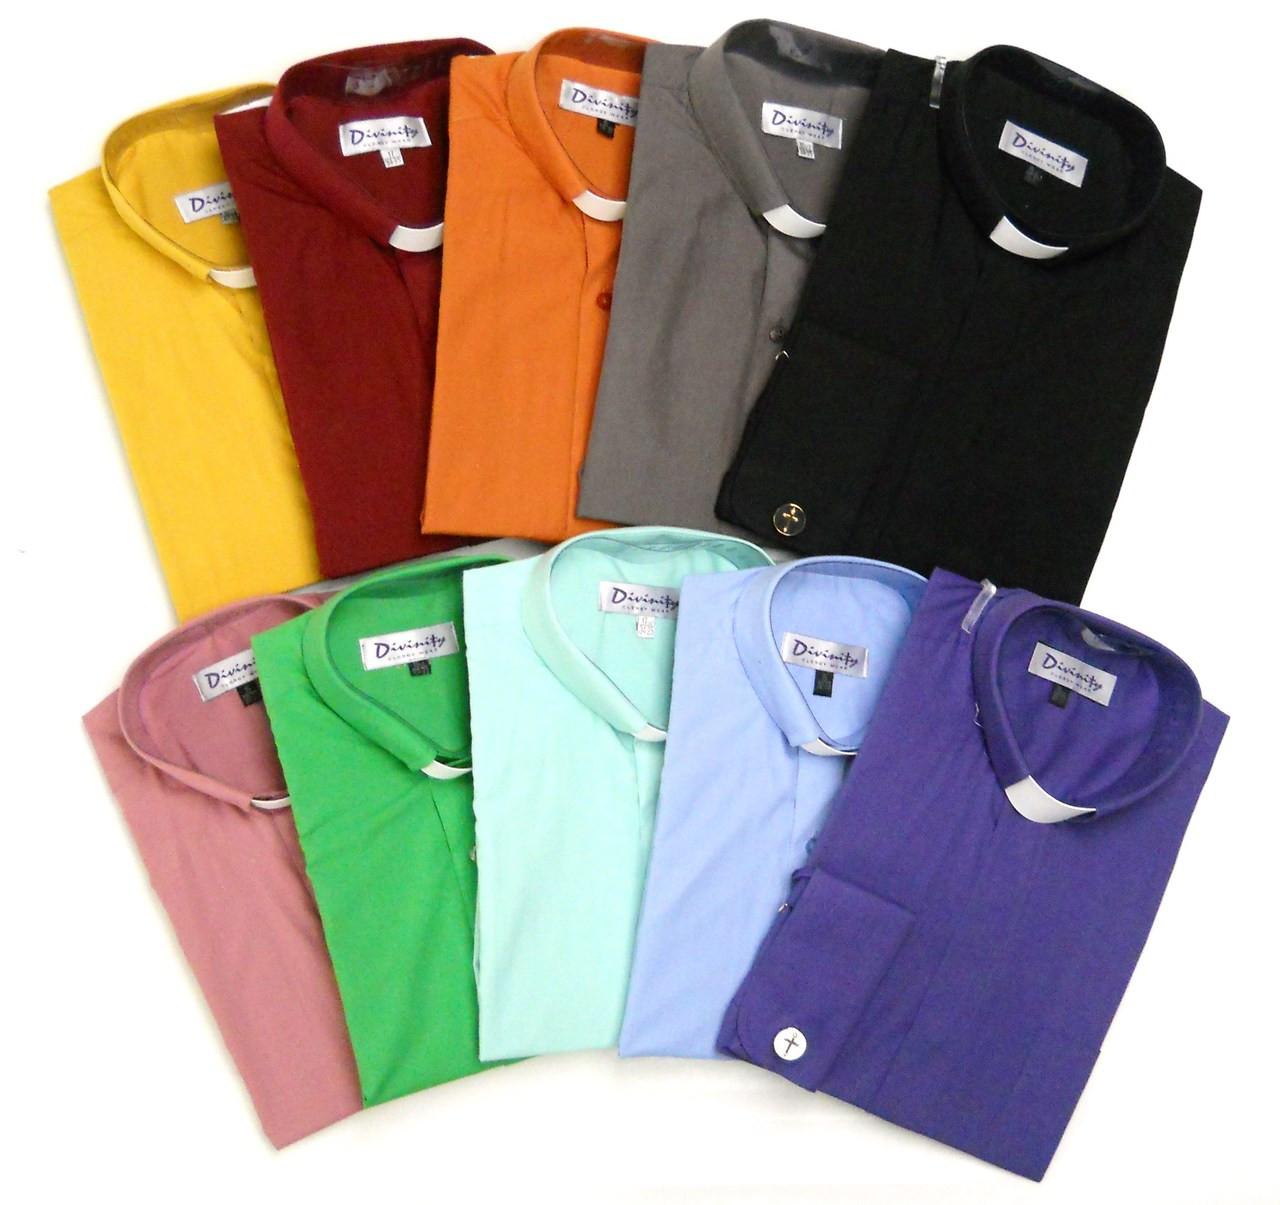 Sale On 4 Tab Collar Clergy Shirts 4 Tab Collar Shirts For 8999